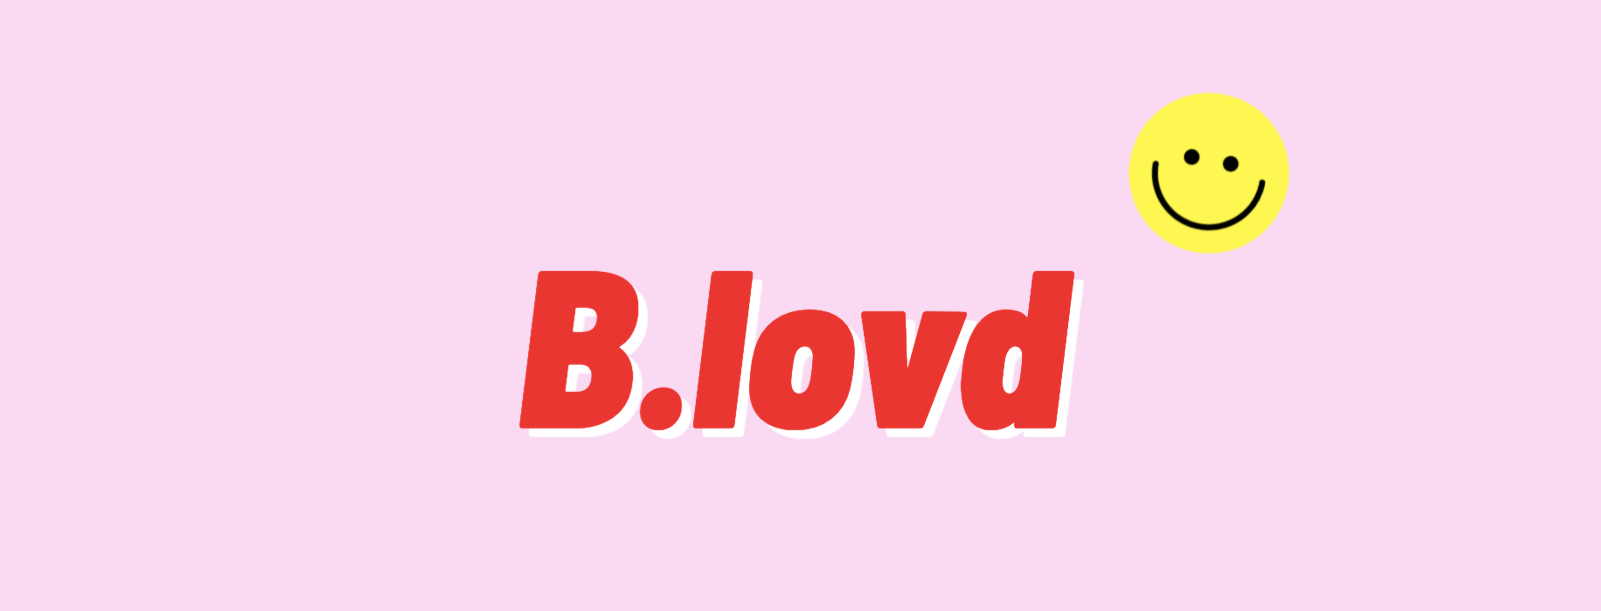 blovd 2